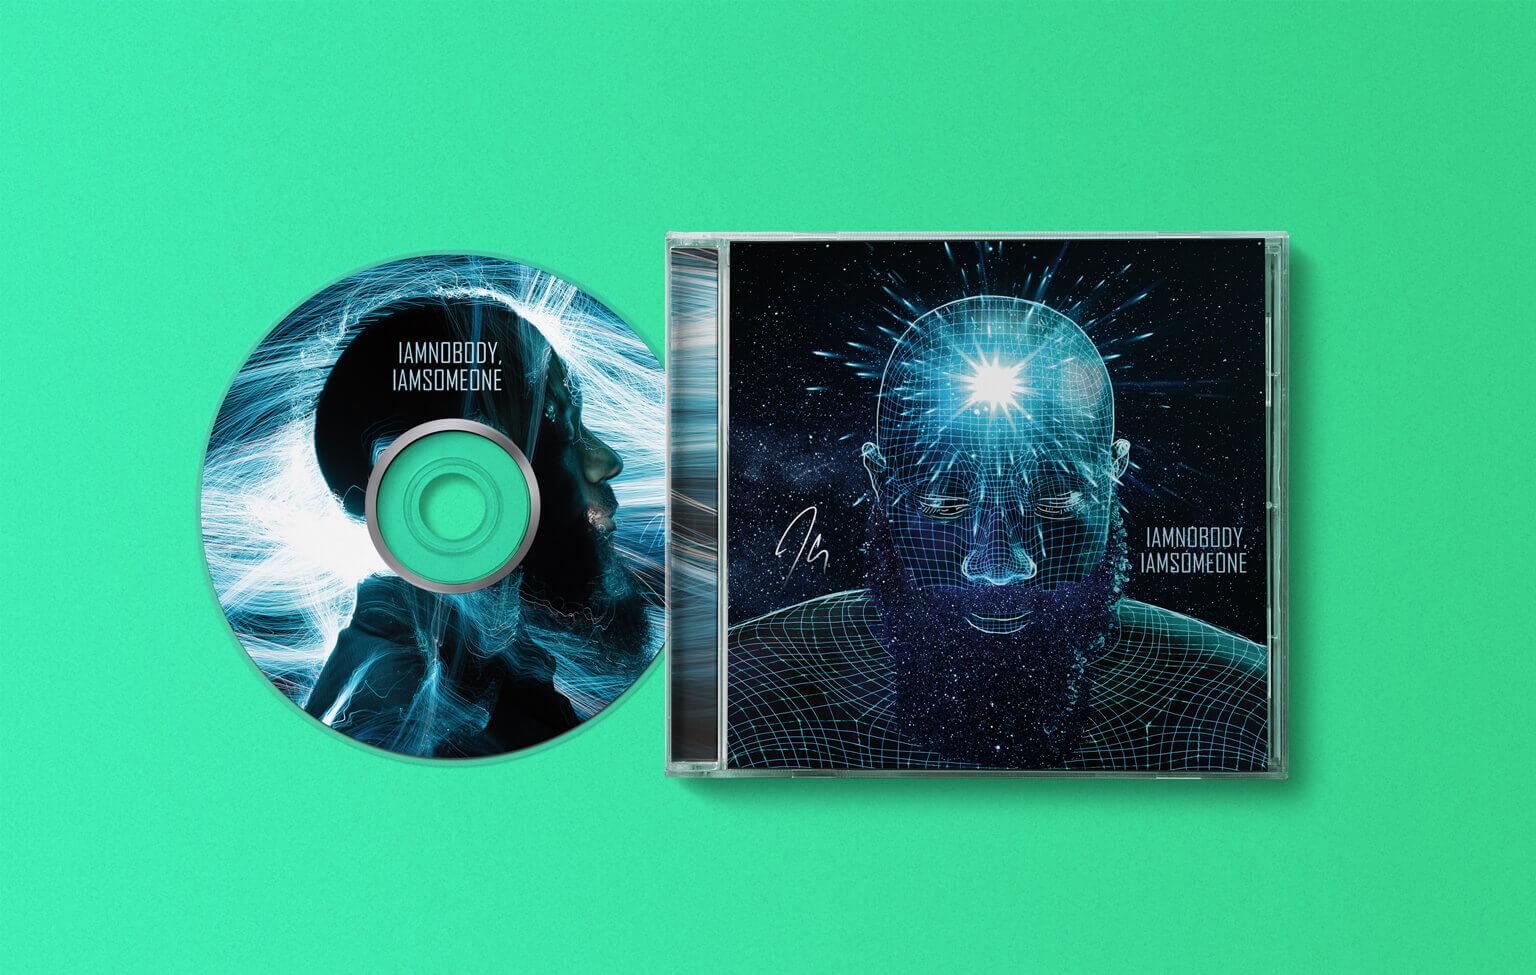 IAMNOBODY, IAMSOMEONE Album and CD